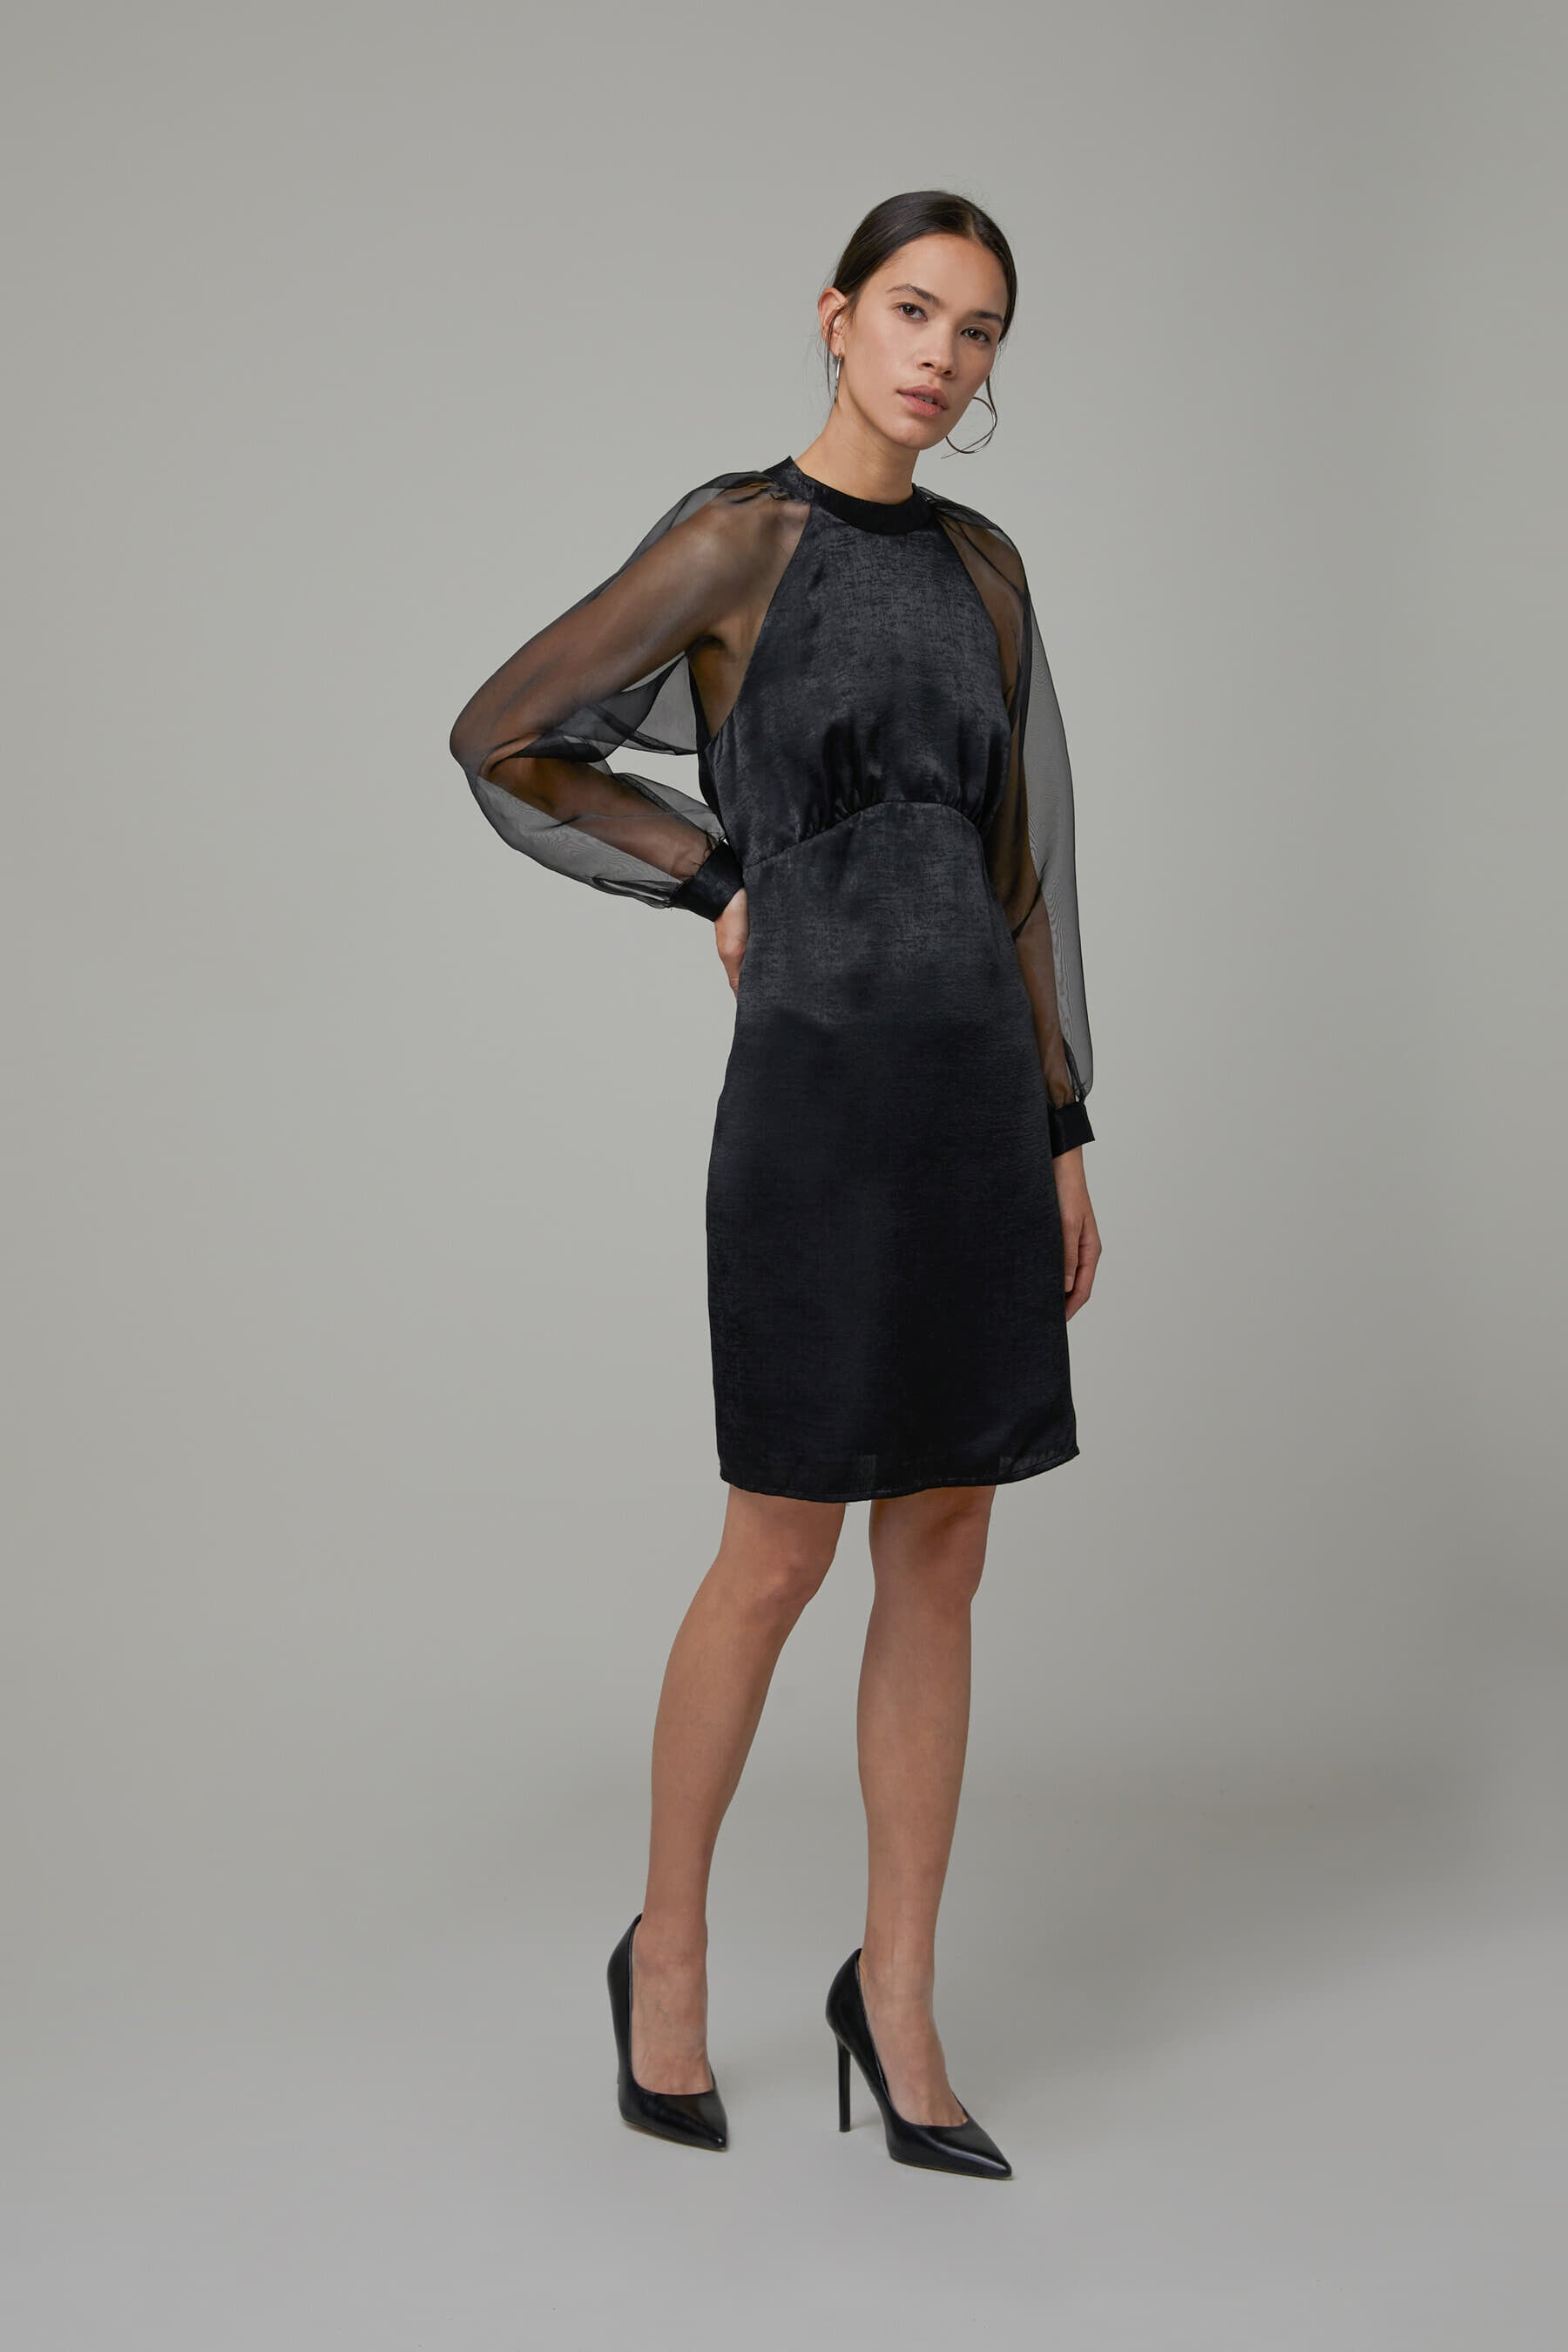 Oak + Fort Sheer Sleeve Dress 3921